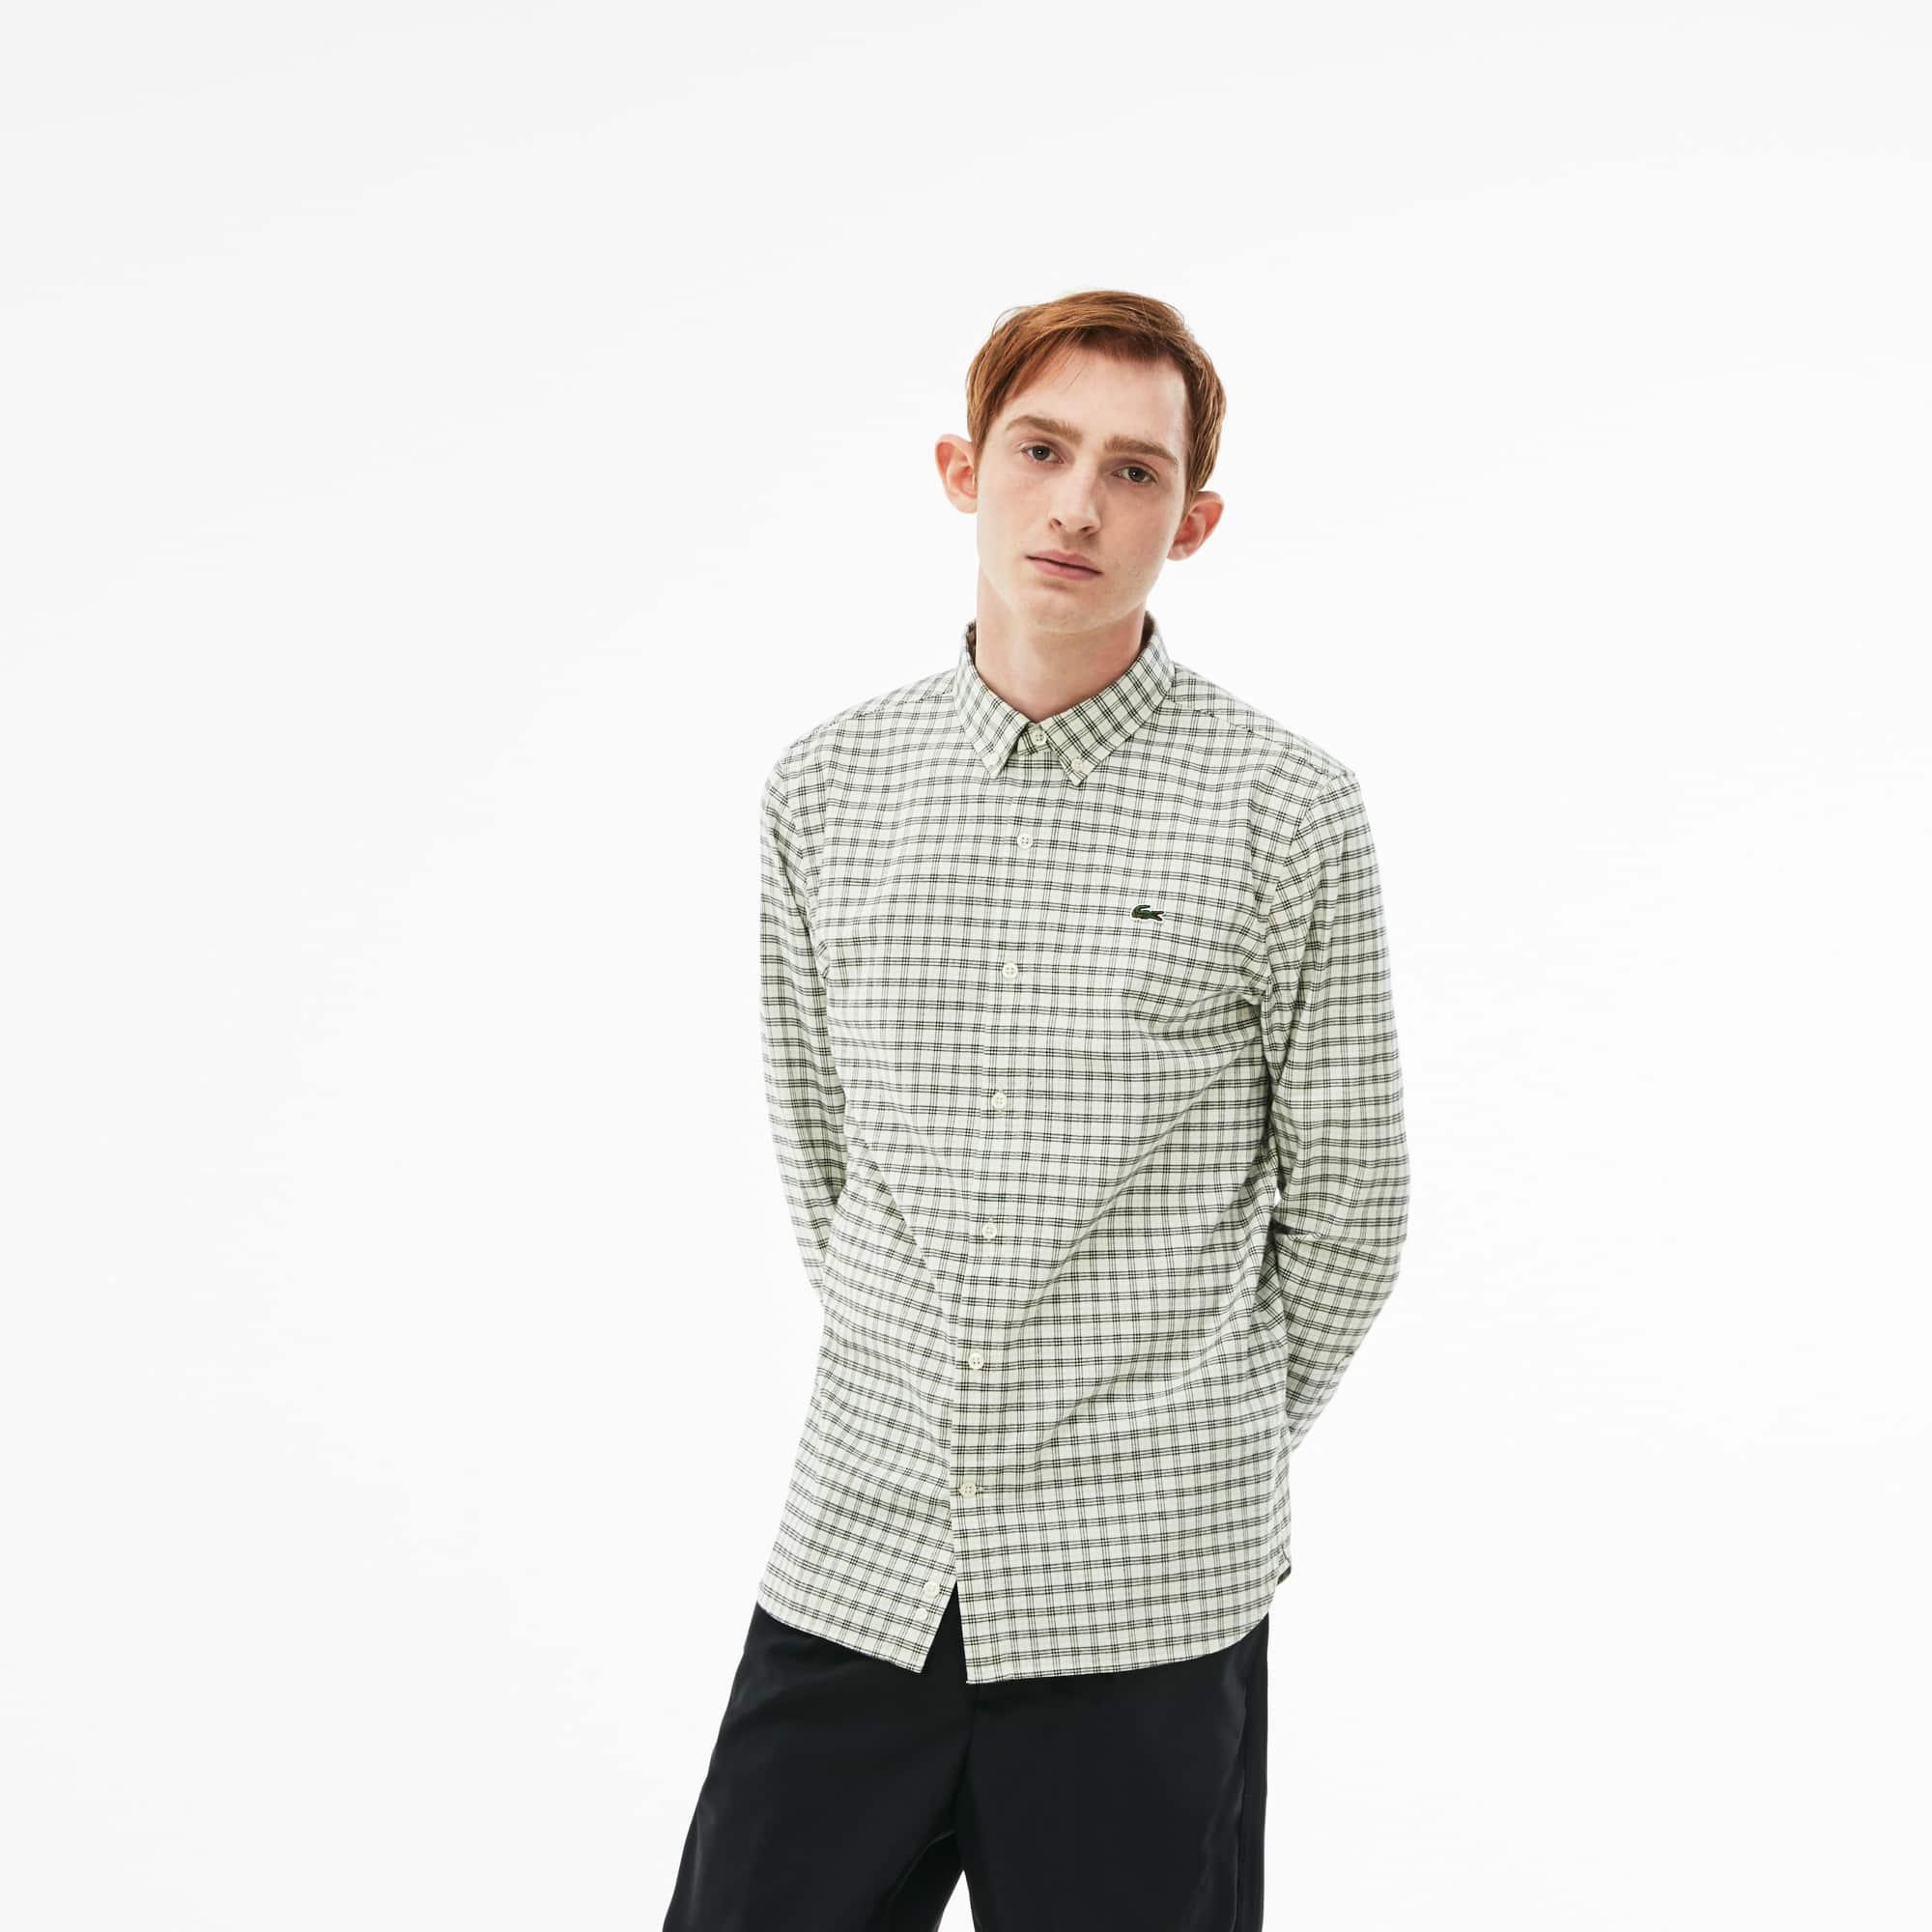 Lacoste LIVE-shirt heren slim fit geruit Oxfordkatoen